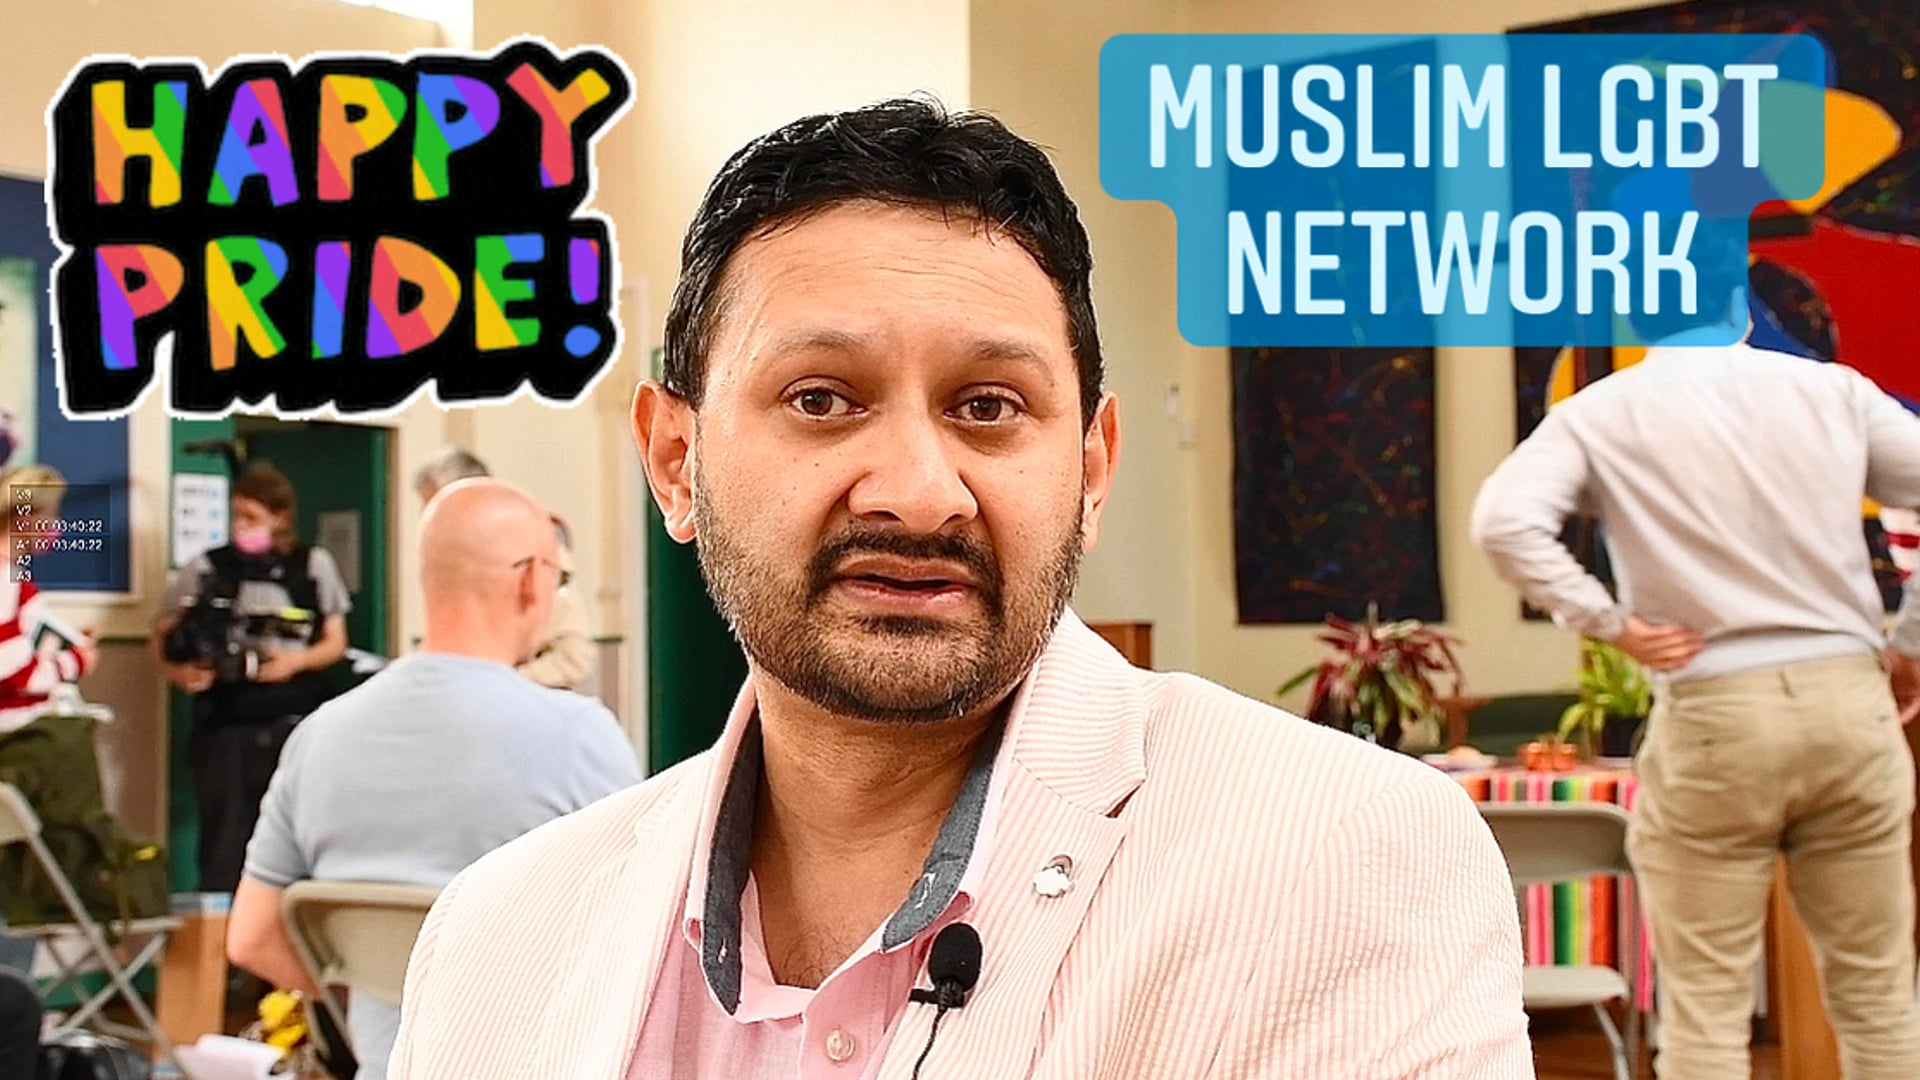 LGBT Muslims at Valentine's Hall